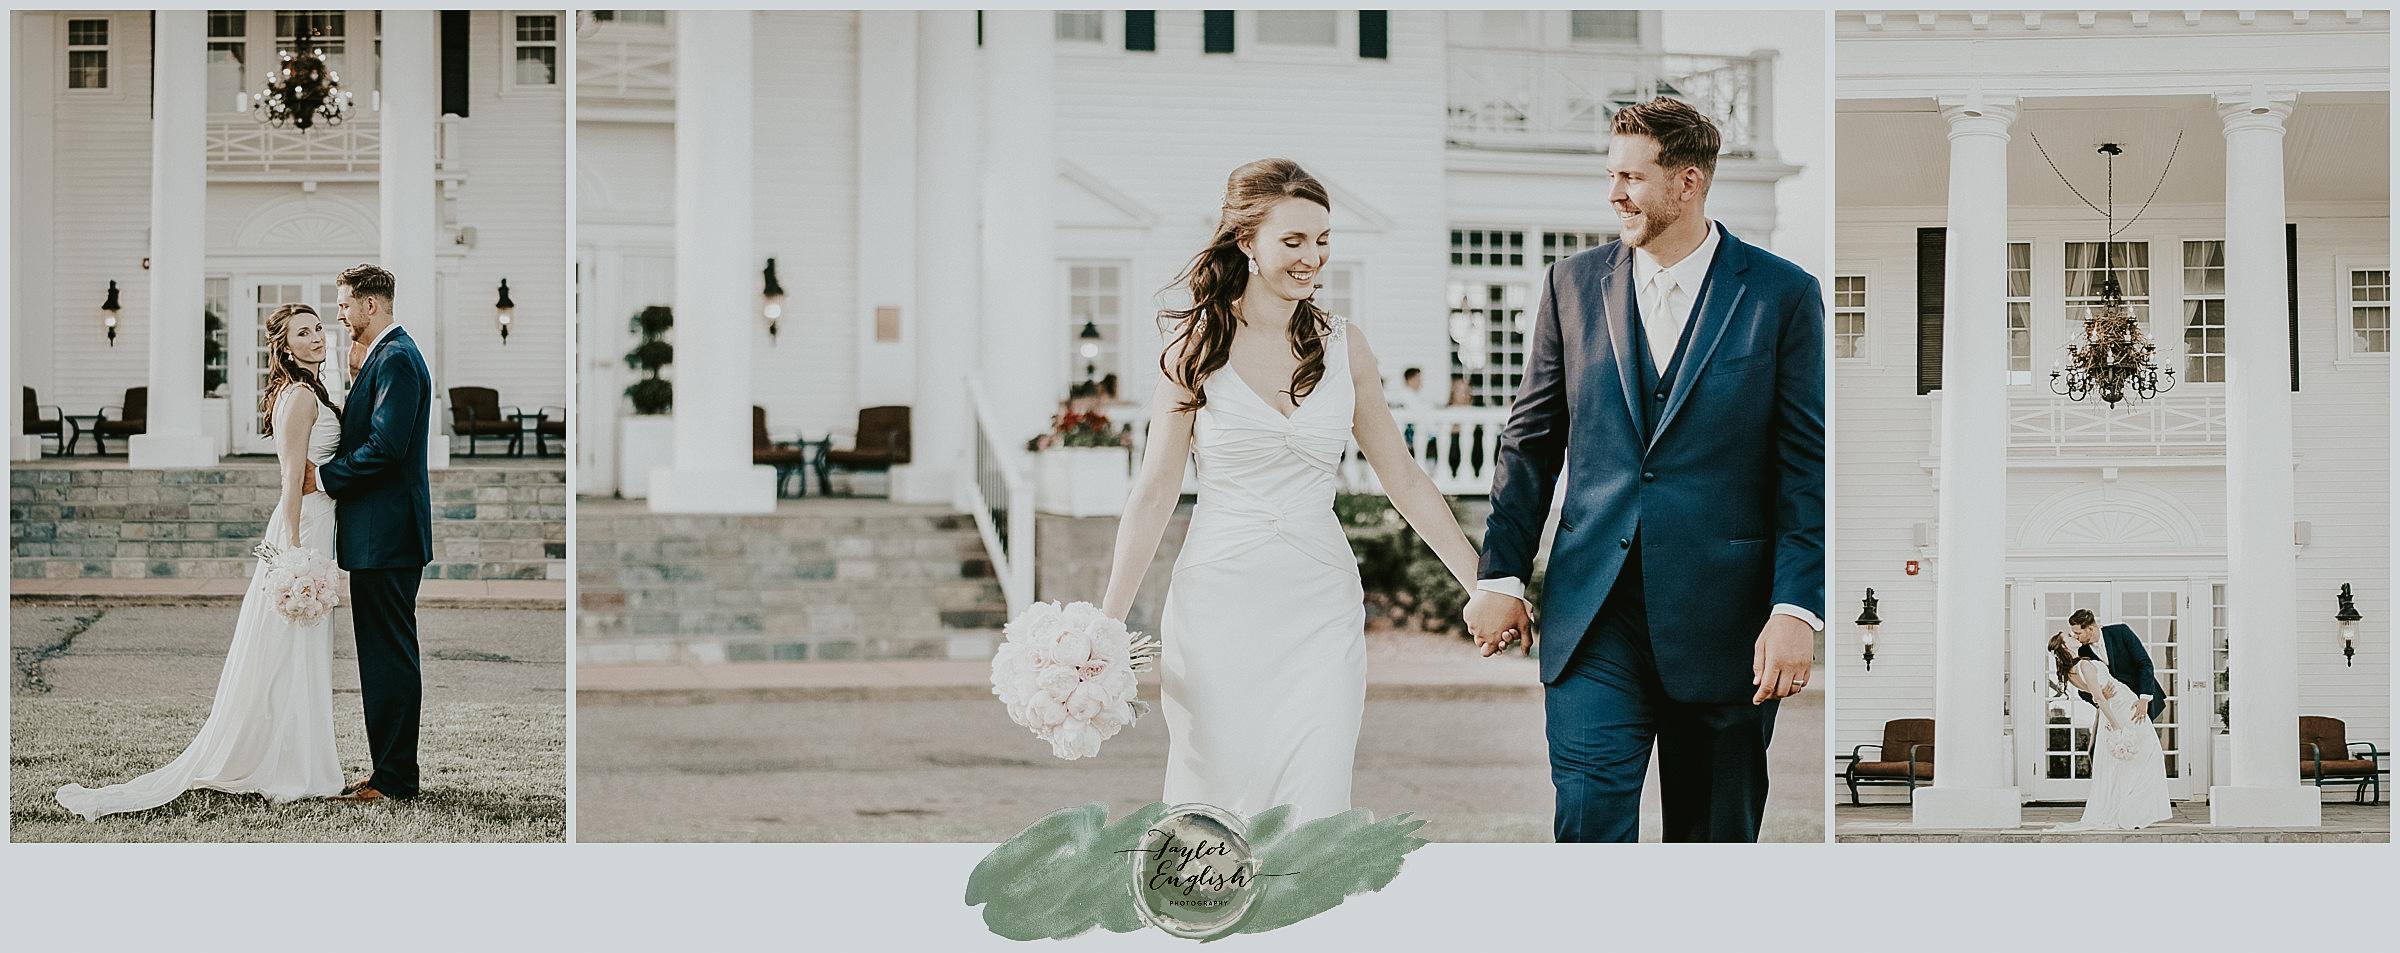 Chattanooga_Wedding_Photographer_Littleton_Colorado9